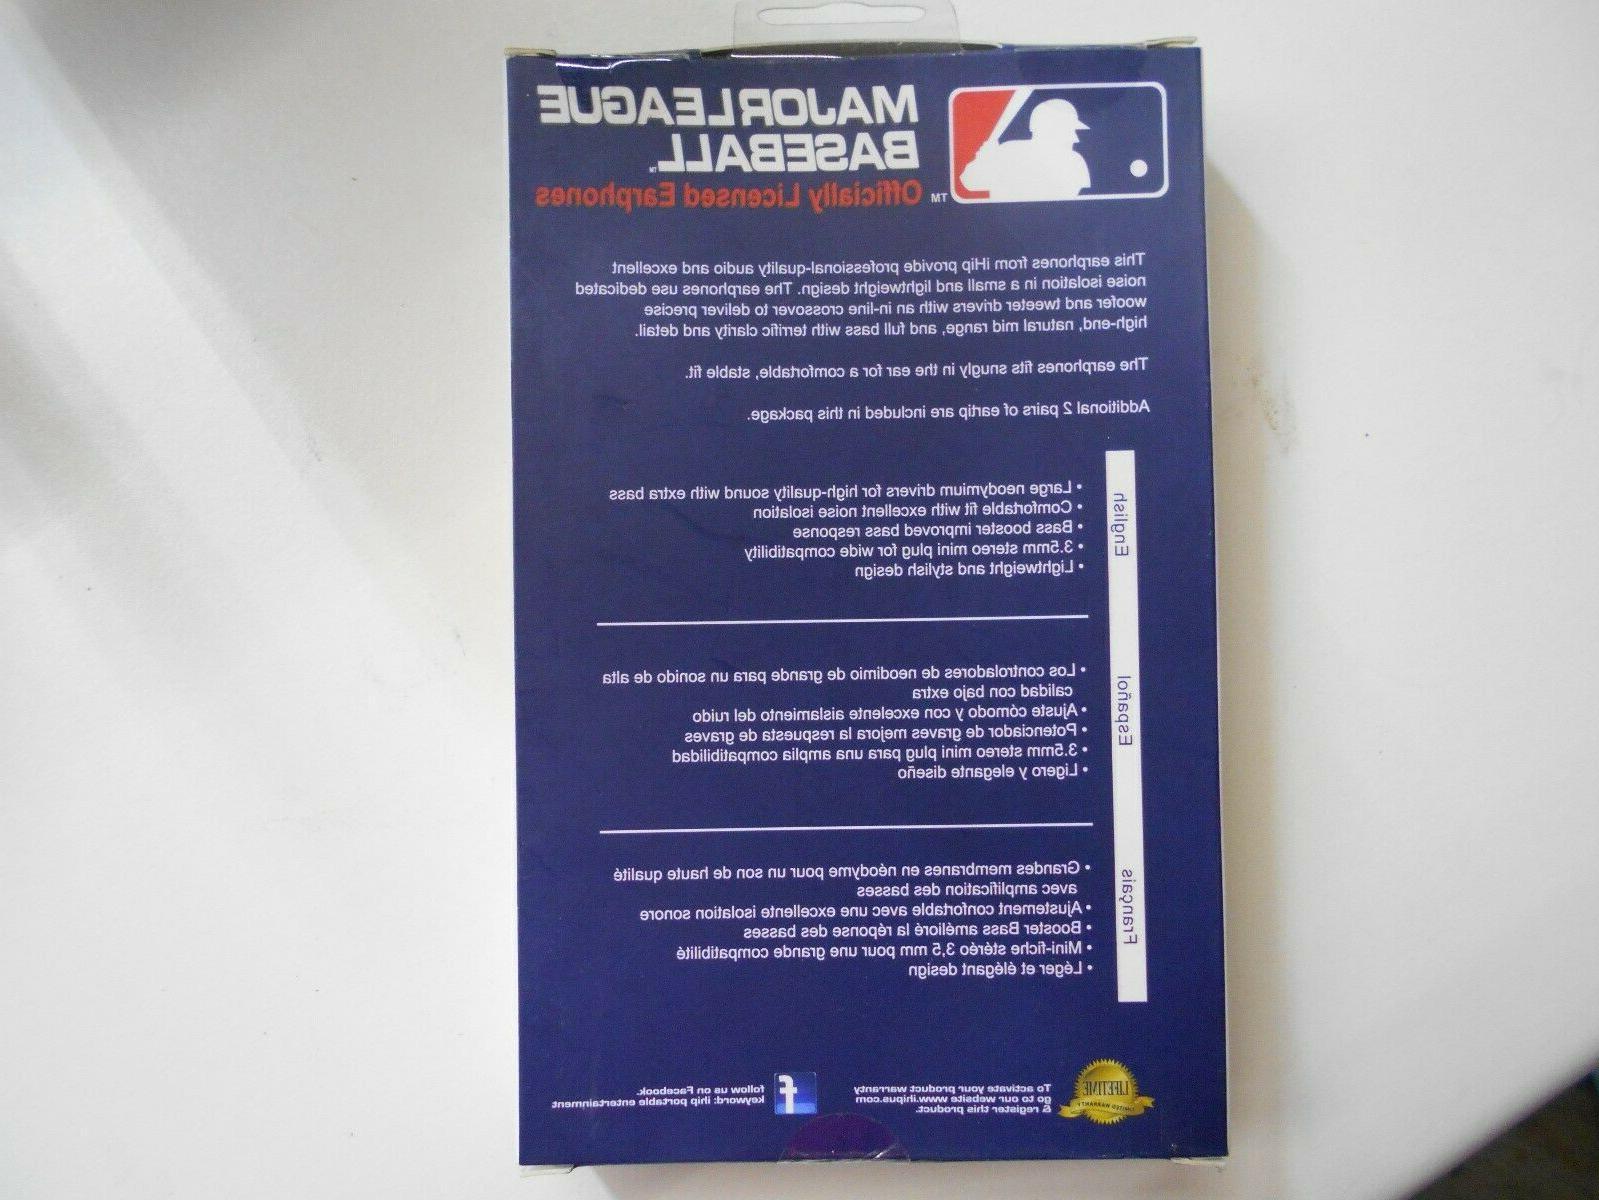 MLB Licensed & Ipod